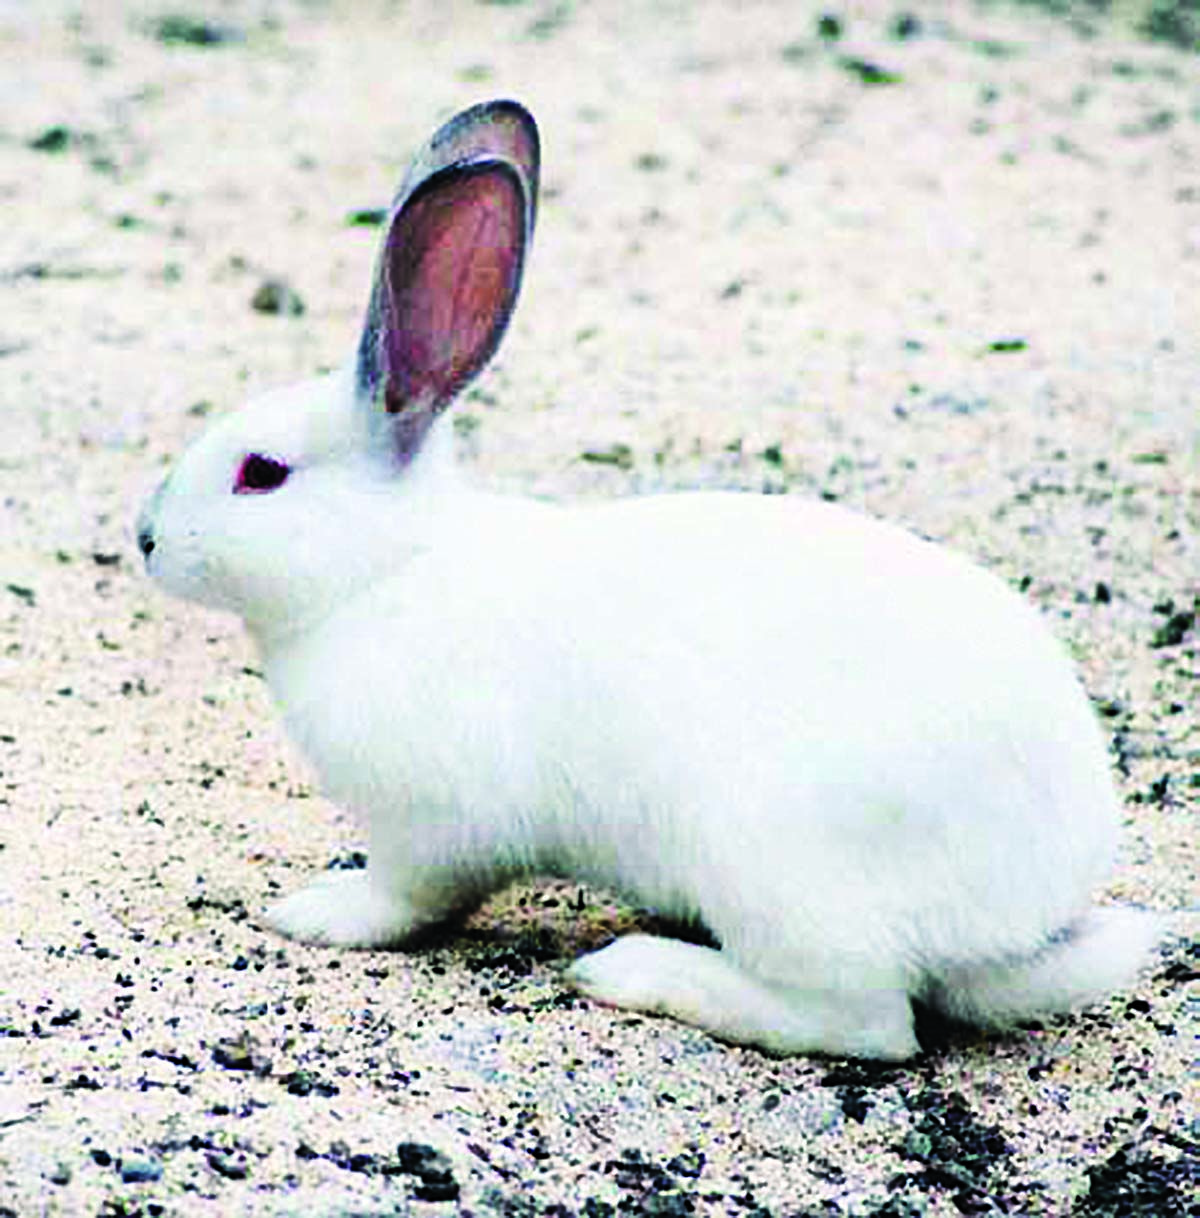 20 Rabbits ideas in 20   raising rabbits, meat rabbits, rabbit